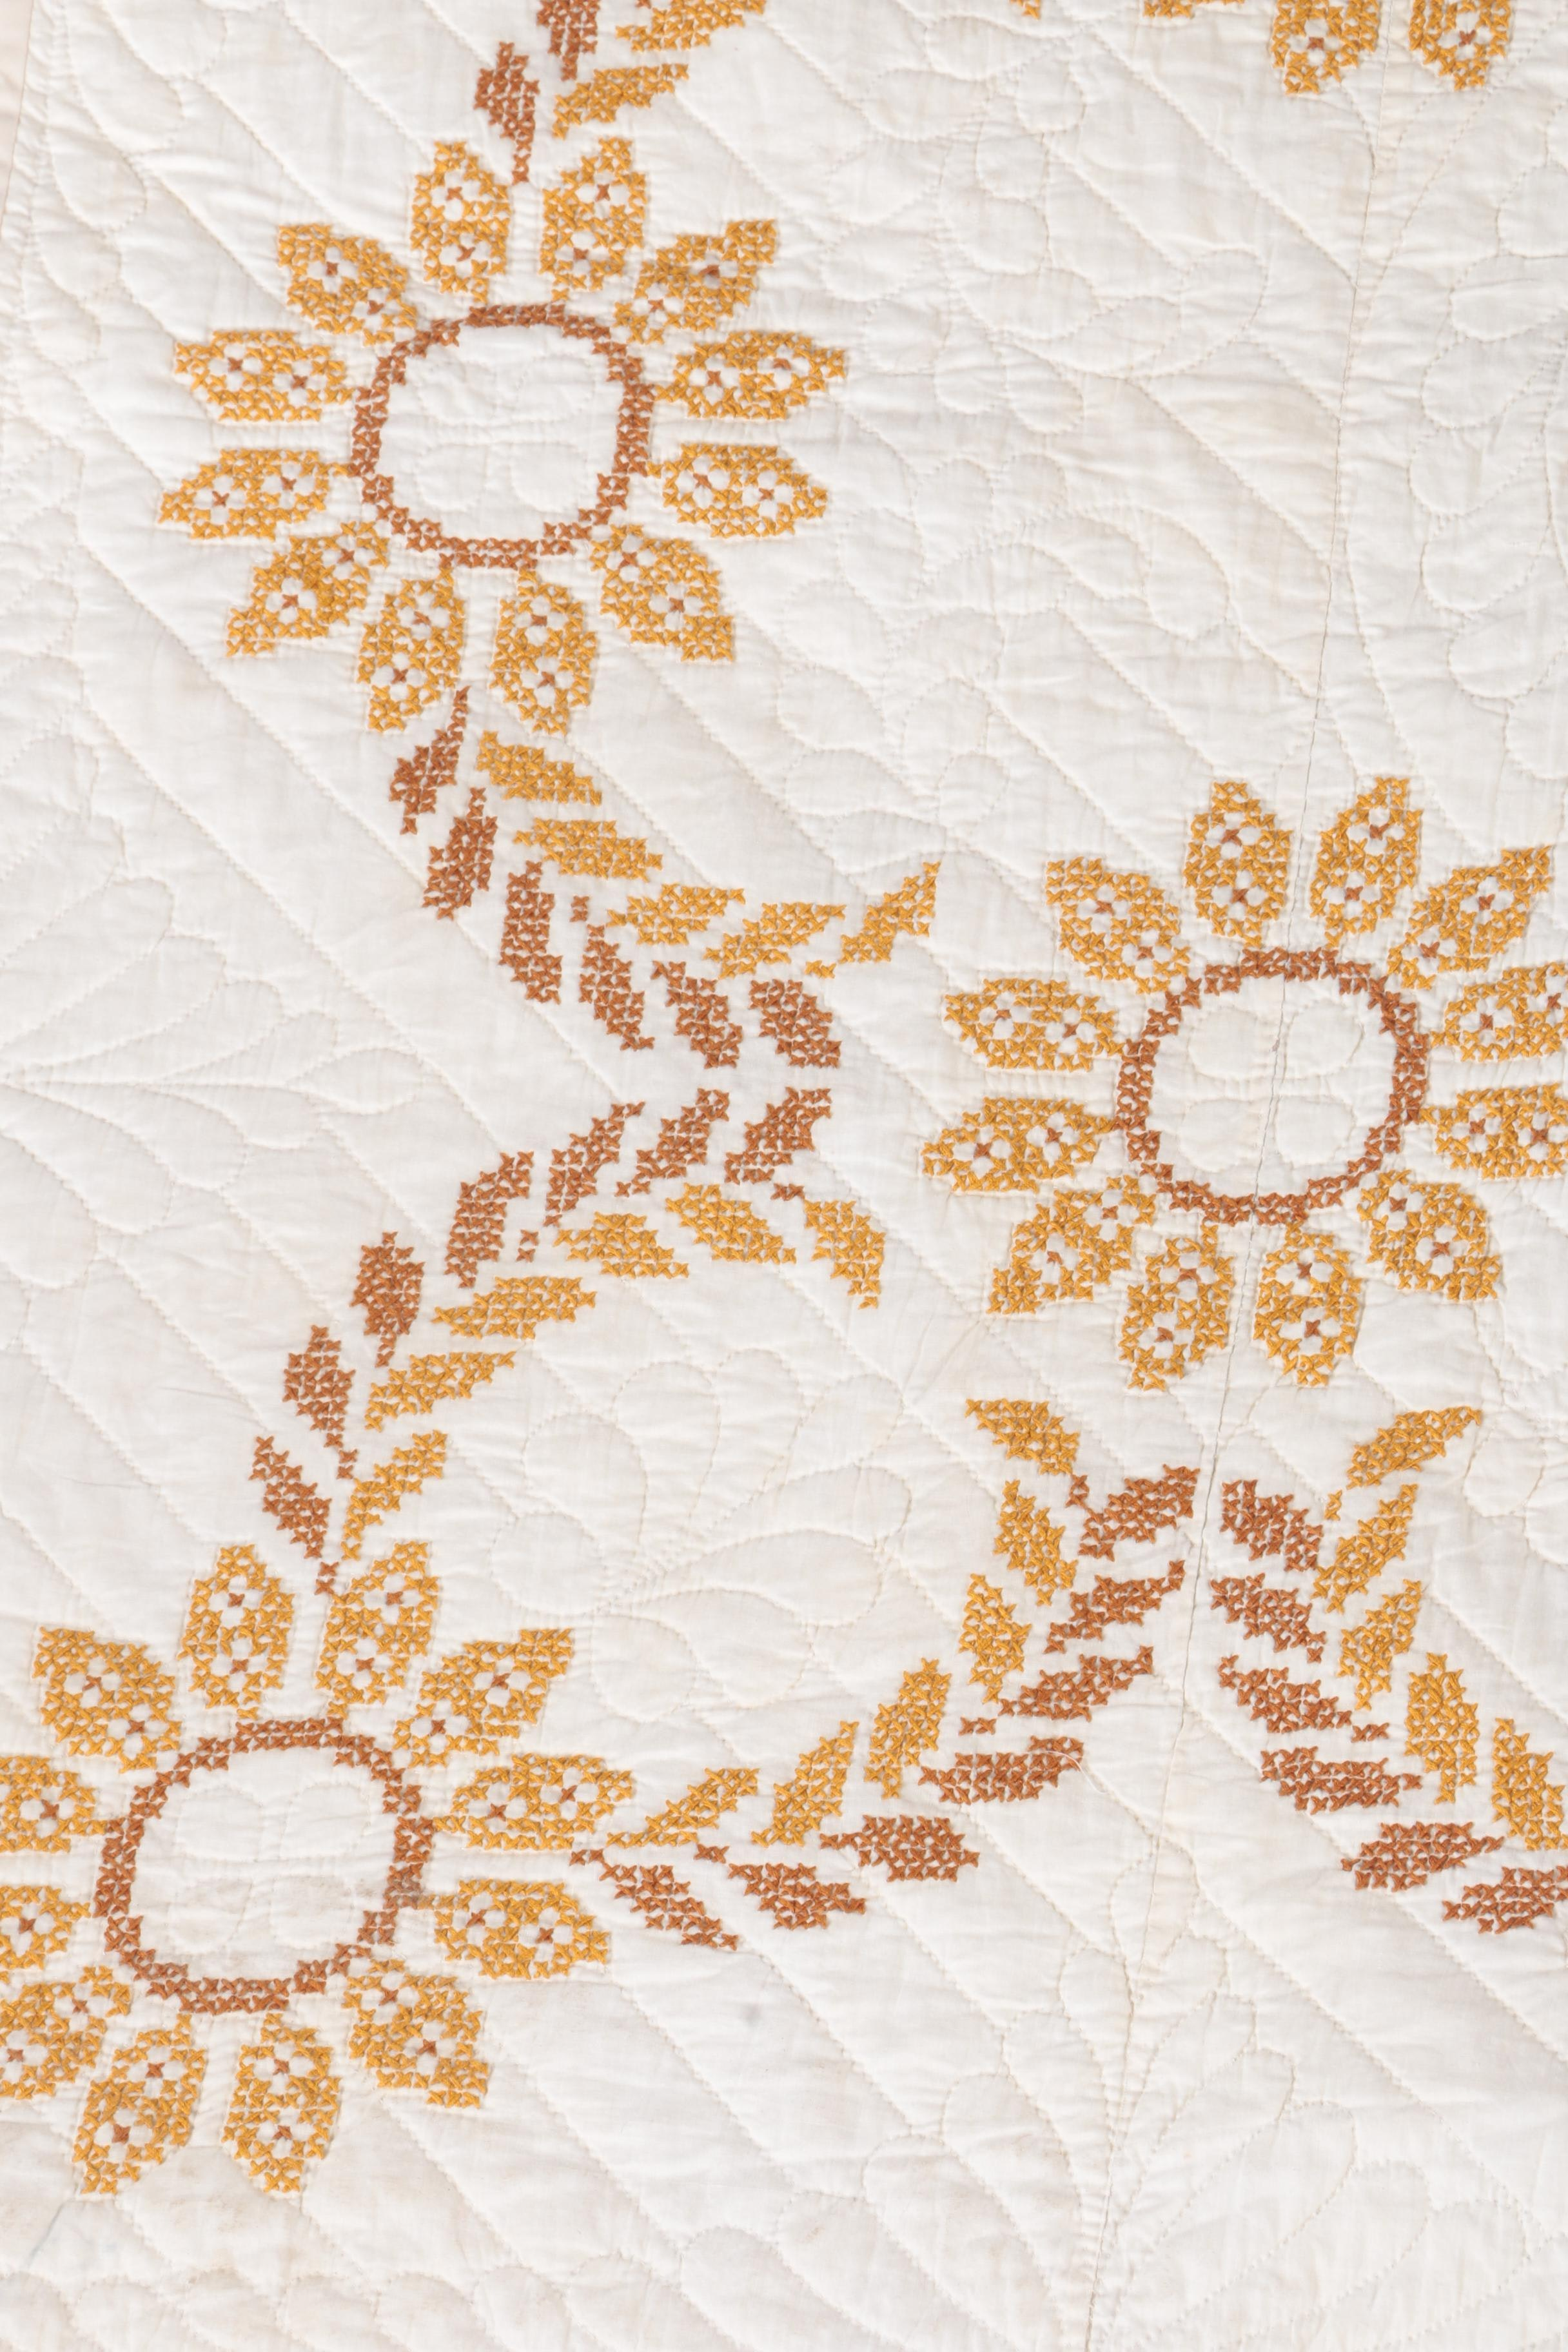 Vintage Handmade Cross Stitch Quilt Ebth